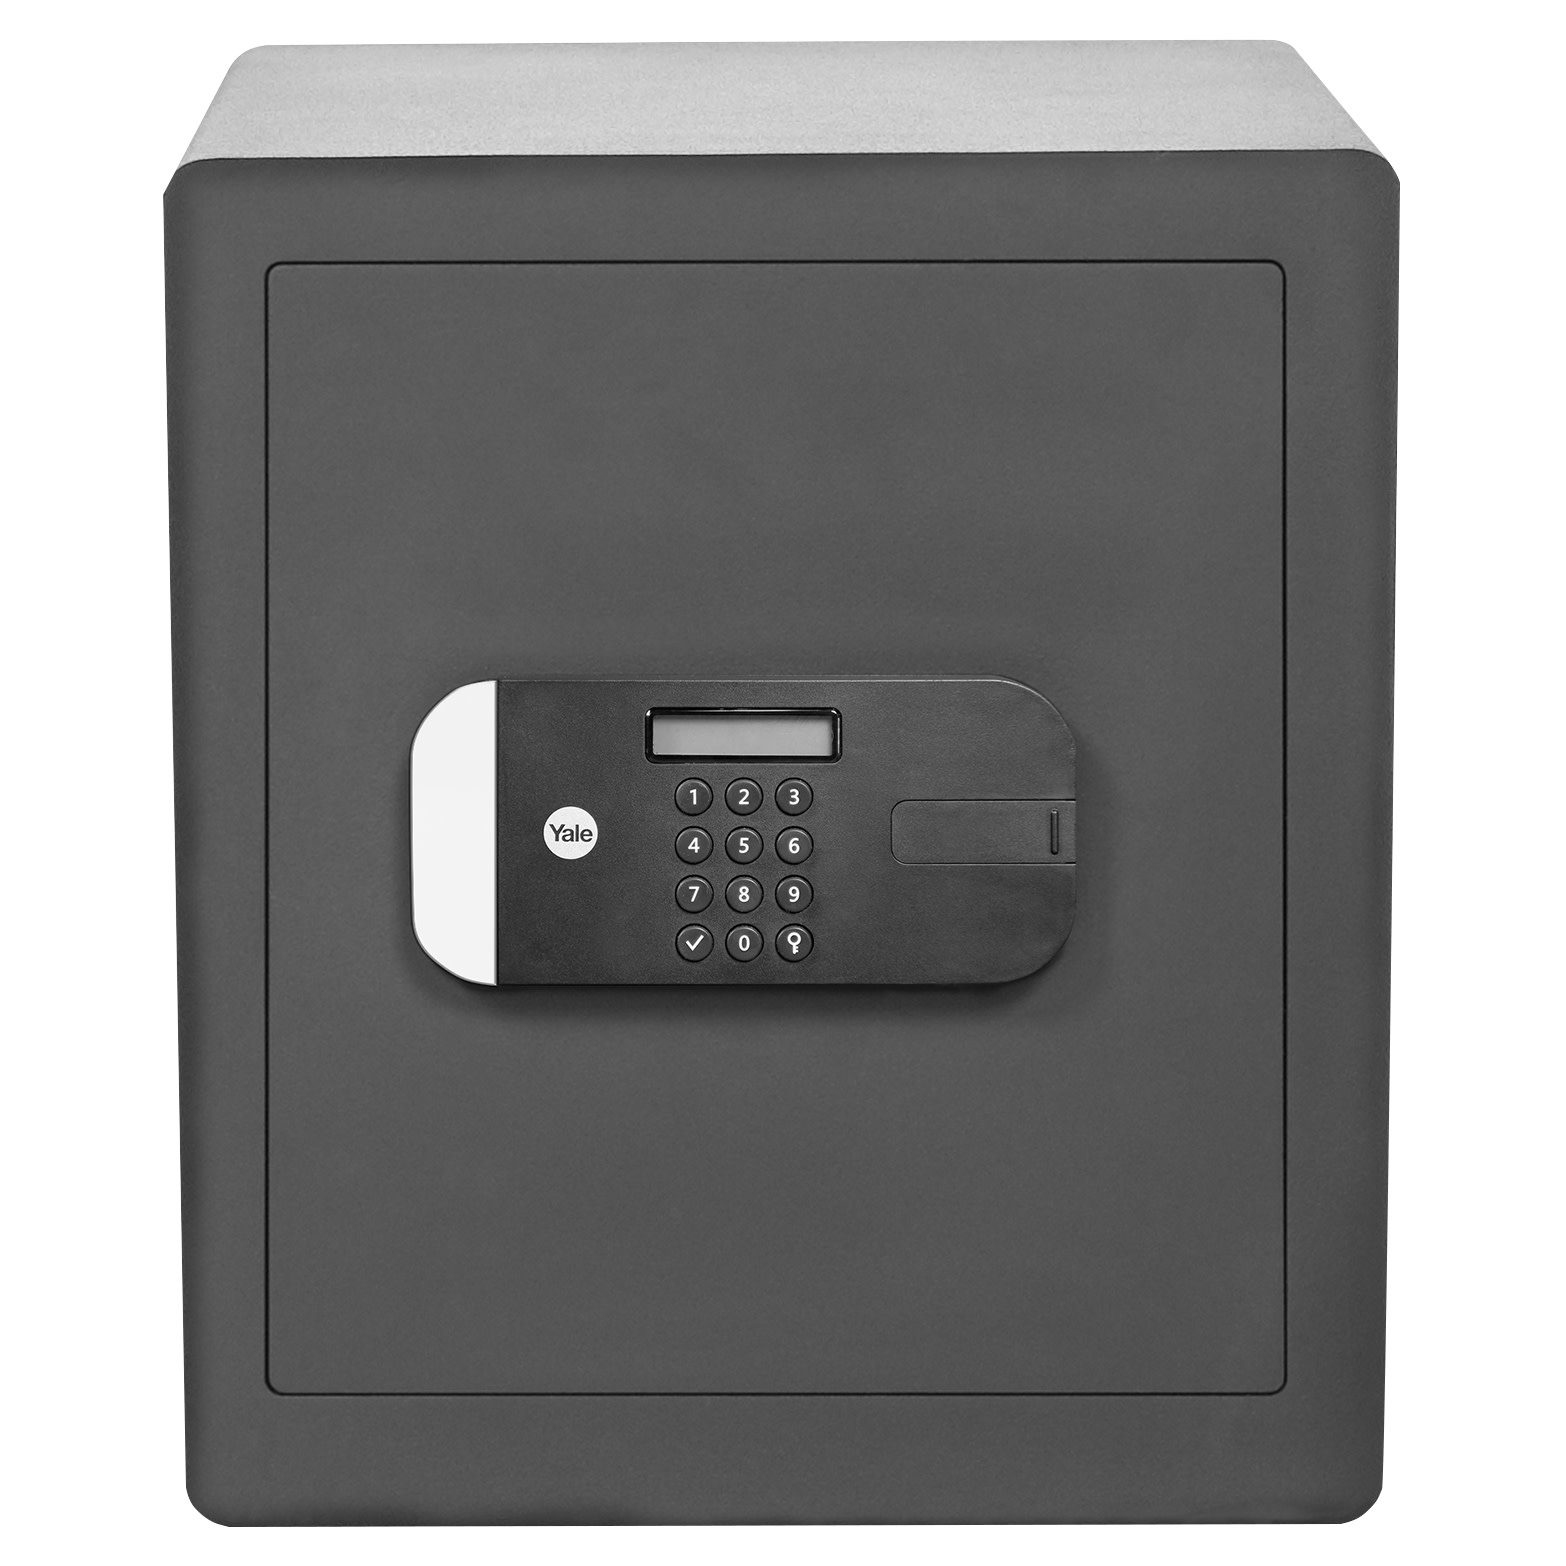 Yale Certified Office Safe - 400 x 350 x 340mm - Grey)